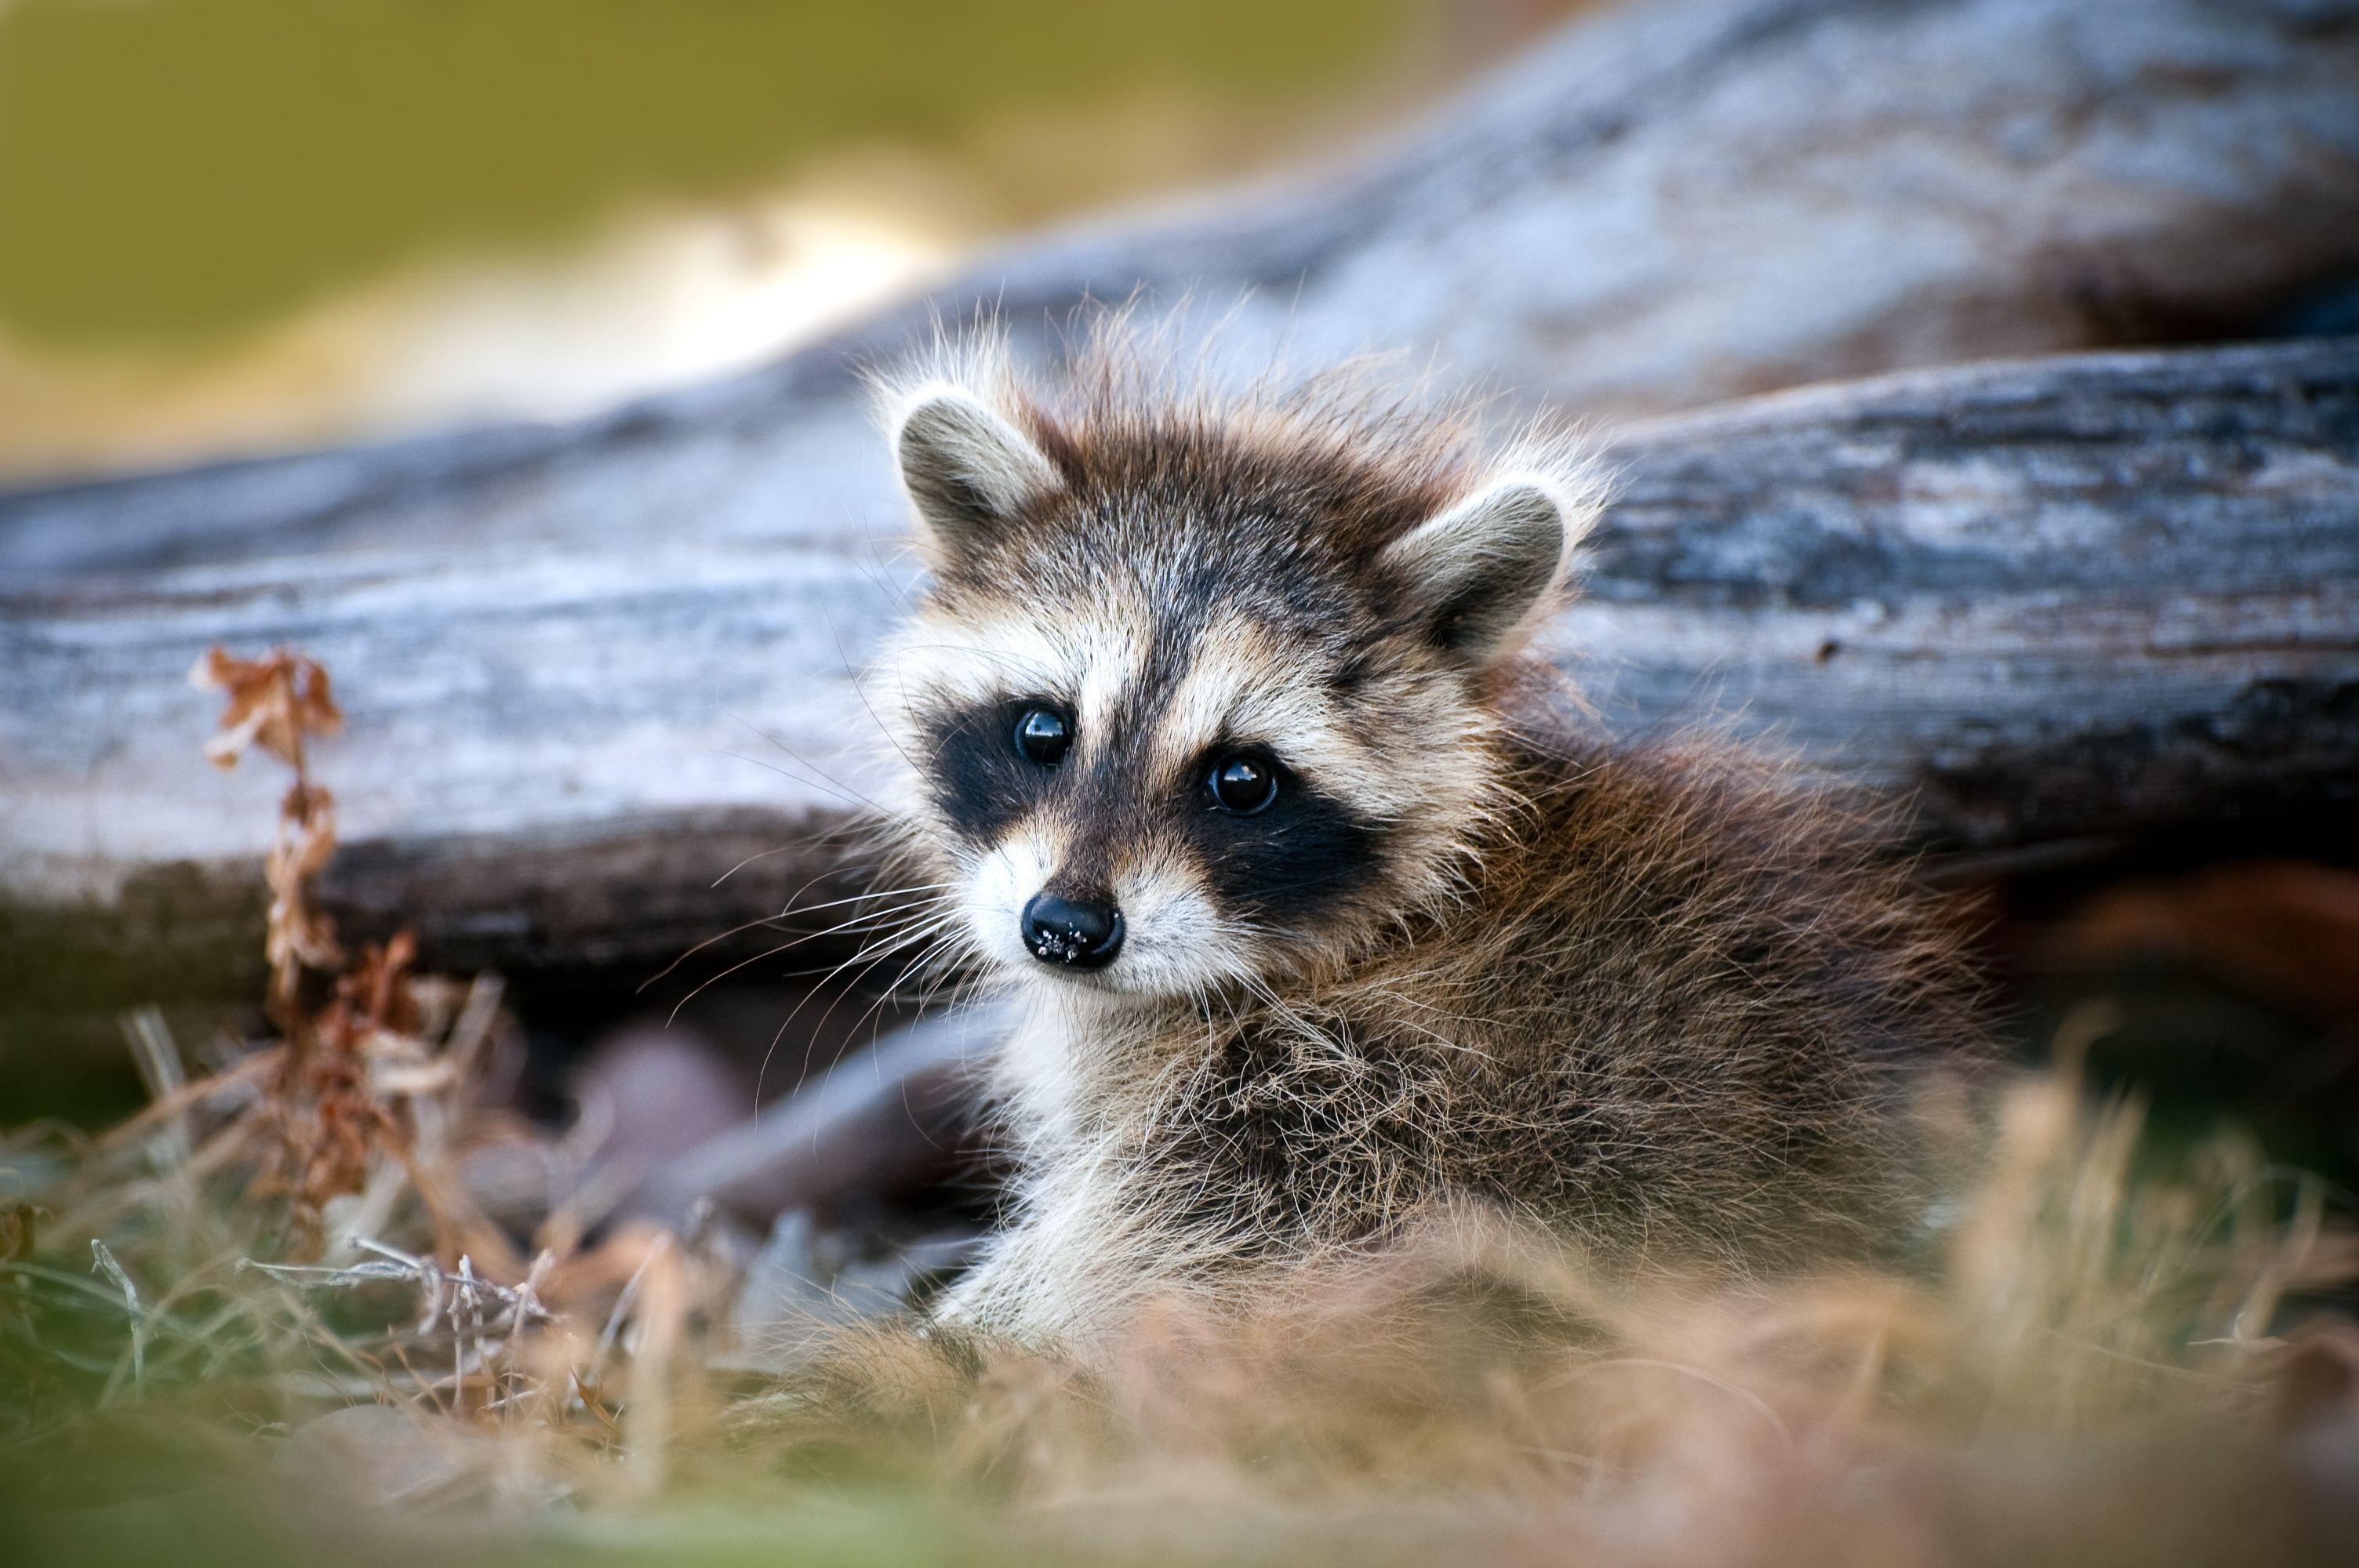 A cute baby raccoon in the woods Cute raccoon, Cute